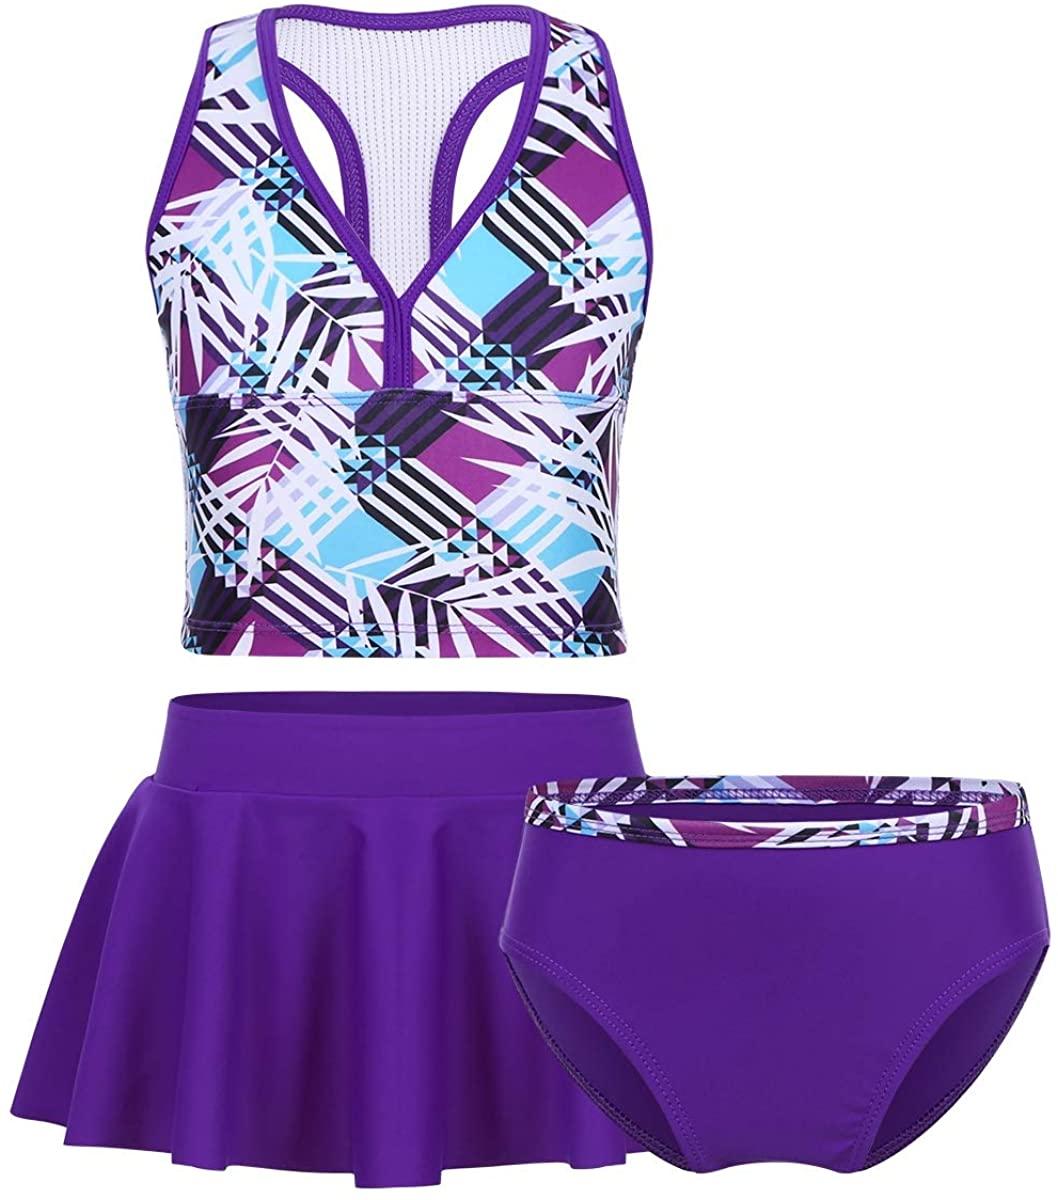 TiaoBug Girls Summer Tankini Separates Watersports Two-Piece Swimsuit Sets Swimwear Briefs Skirt Bathing Suits